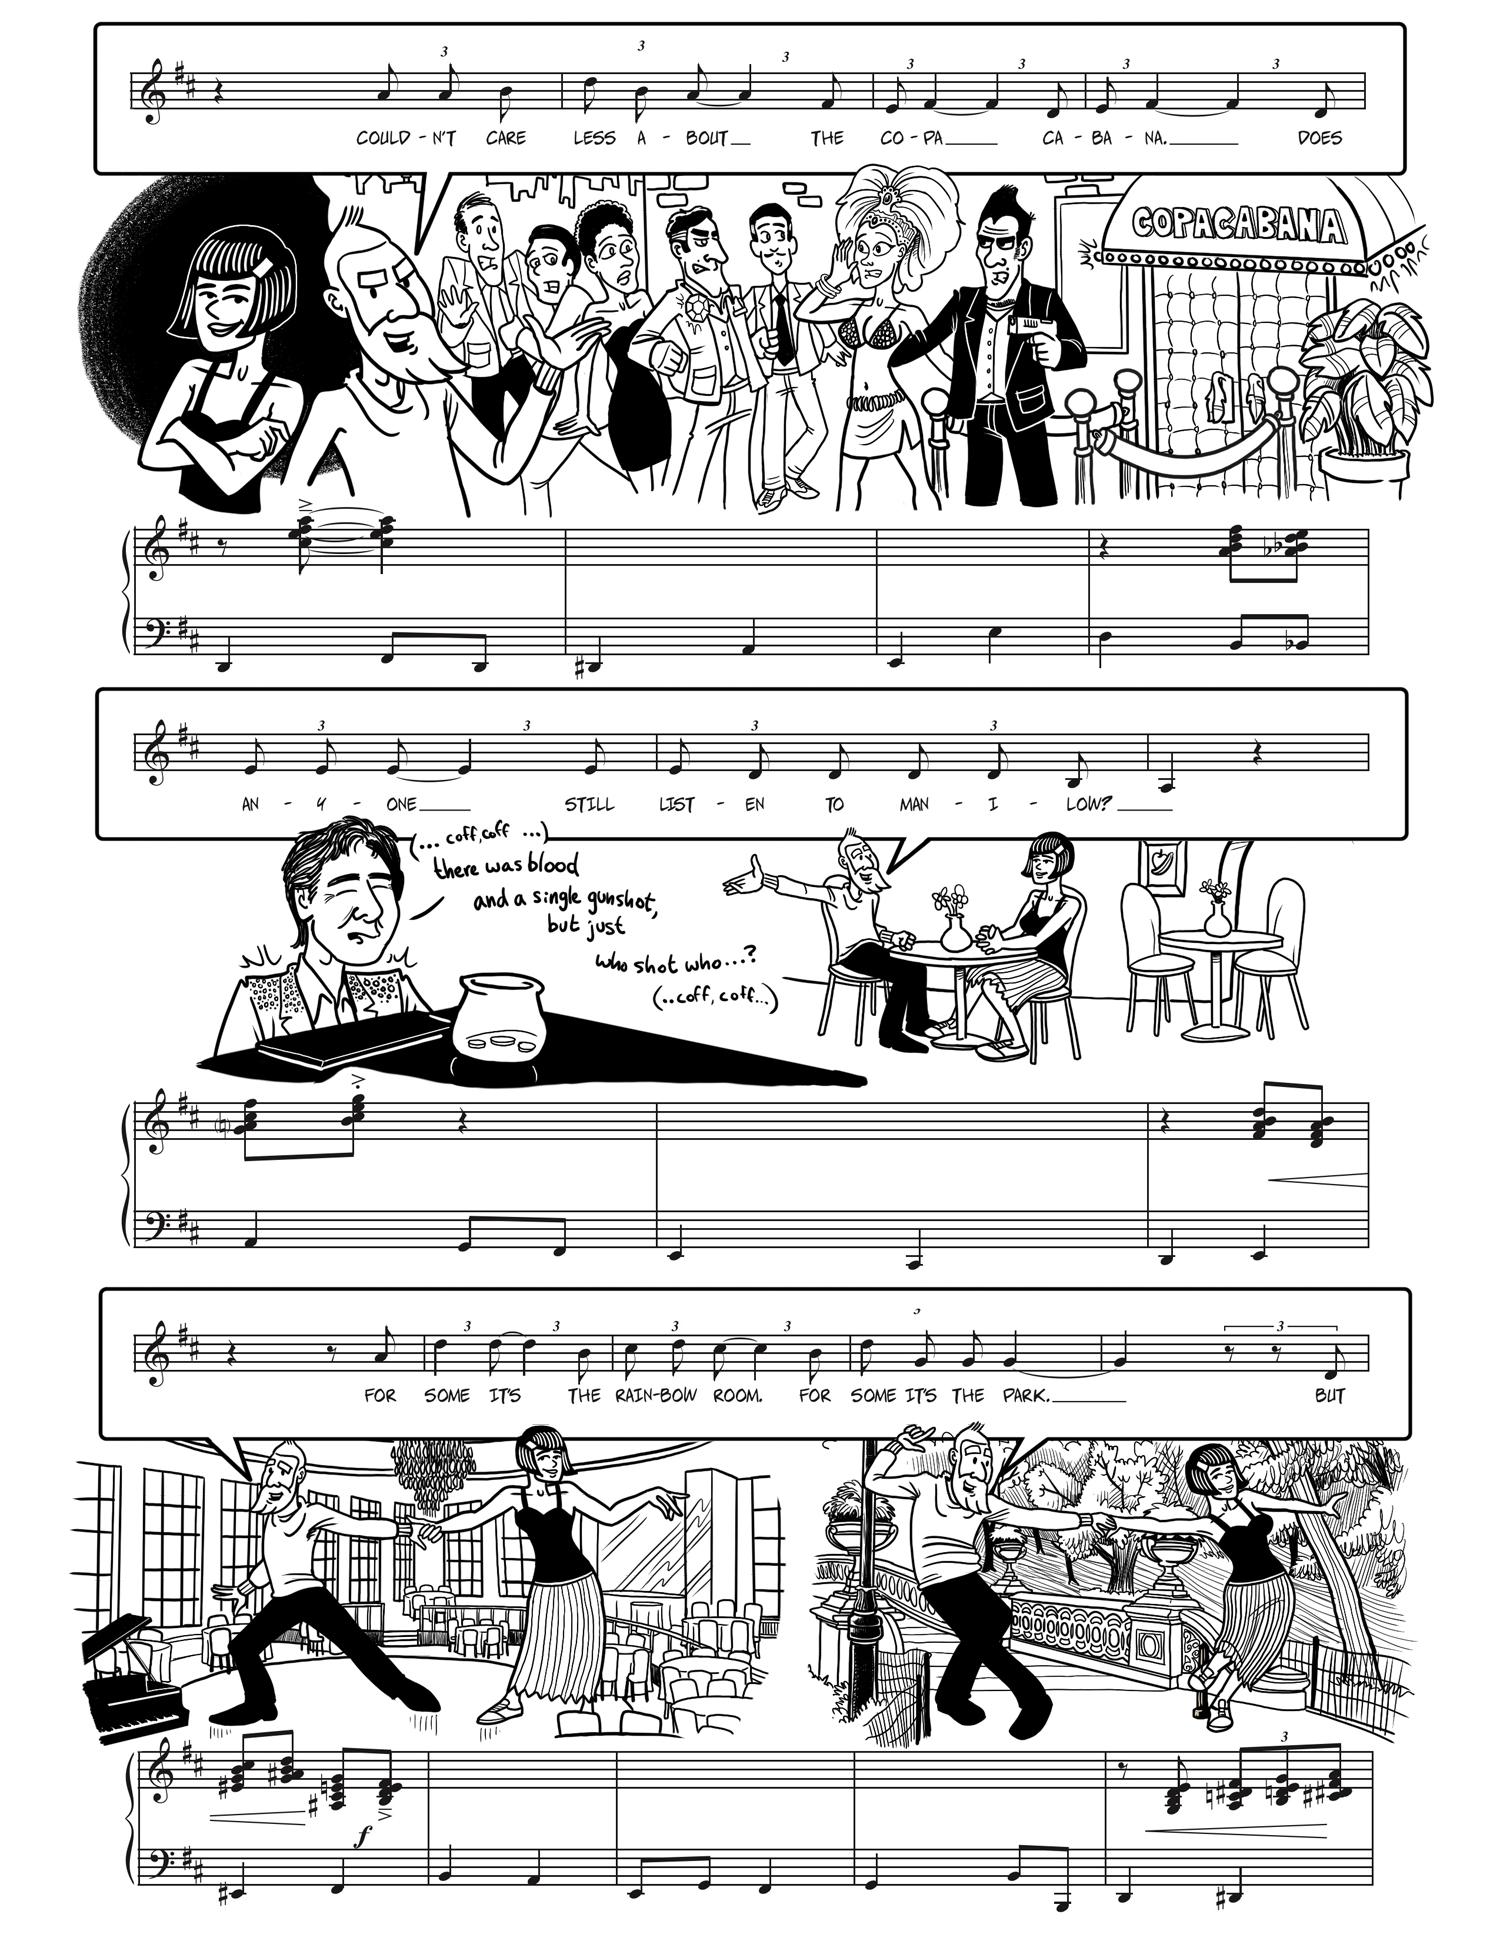 PAGE-354.jpg